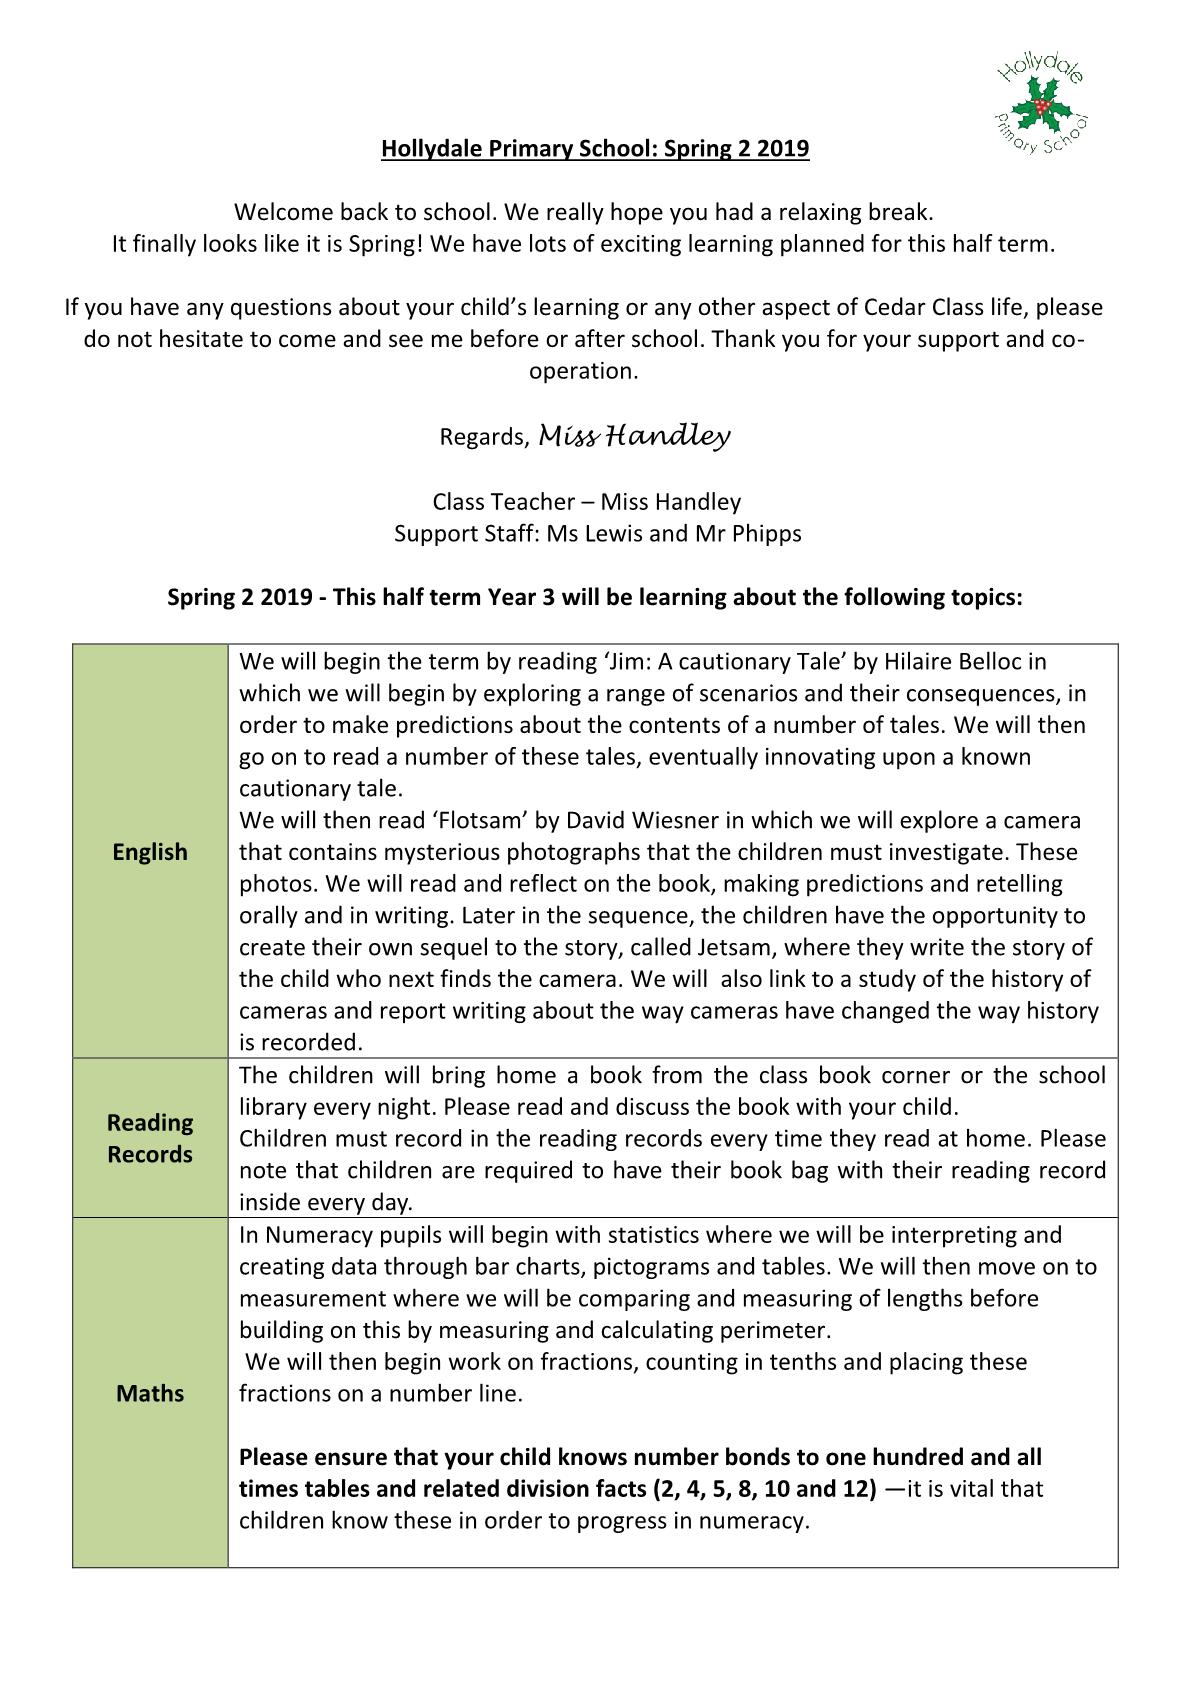 Spring 2 Cedar Newsletter 2019